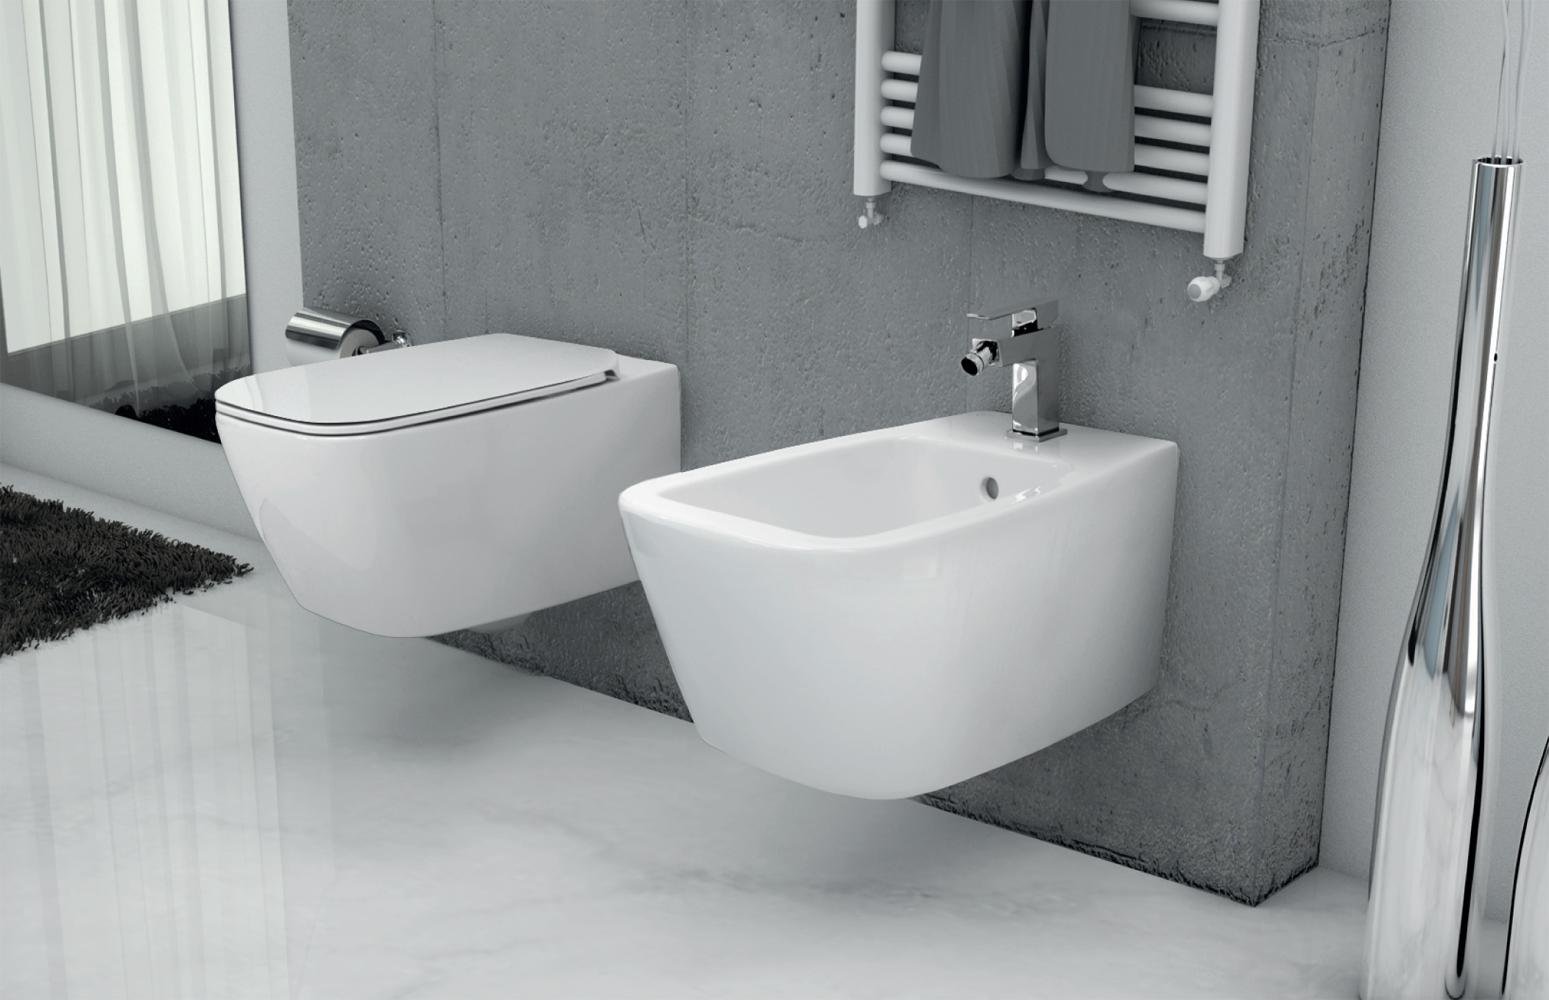 Sanitari sospesi filo muro serie 21 ideal standard vaso wc for Sanitari sospesi